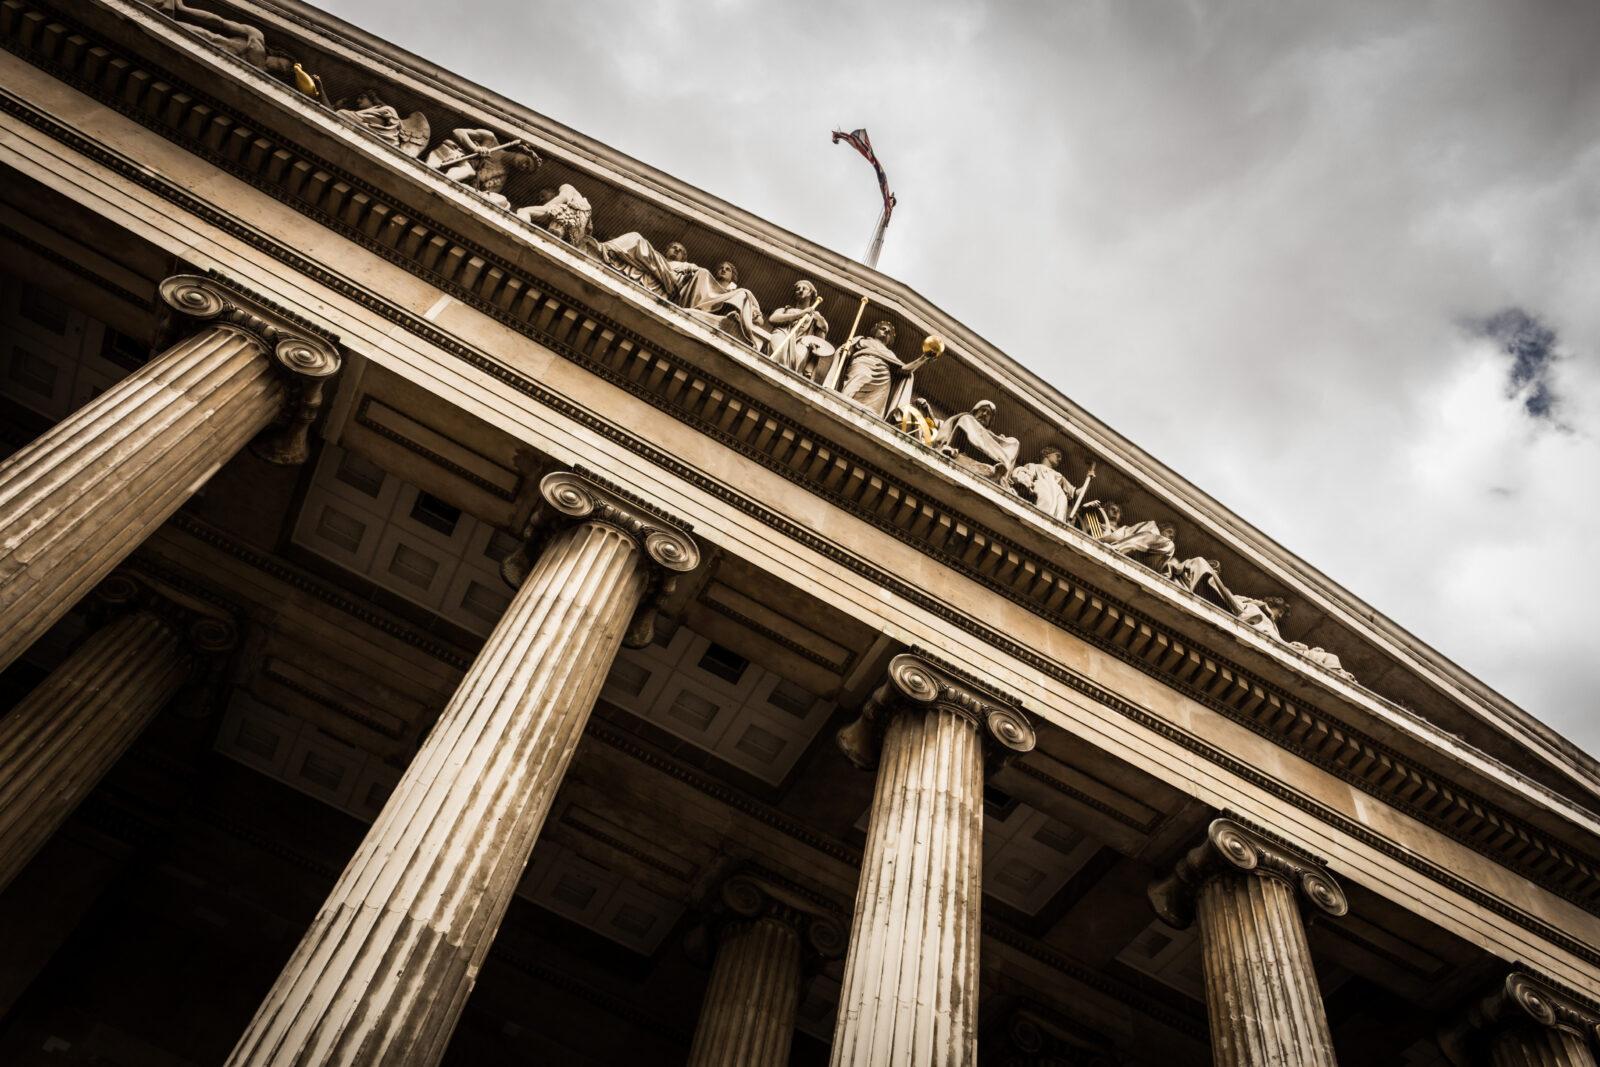 COVID-19: Danmarks Domstole lukker gradvist op for civile retssager